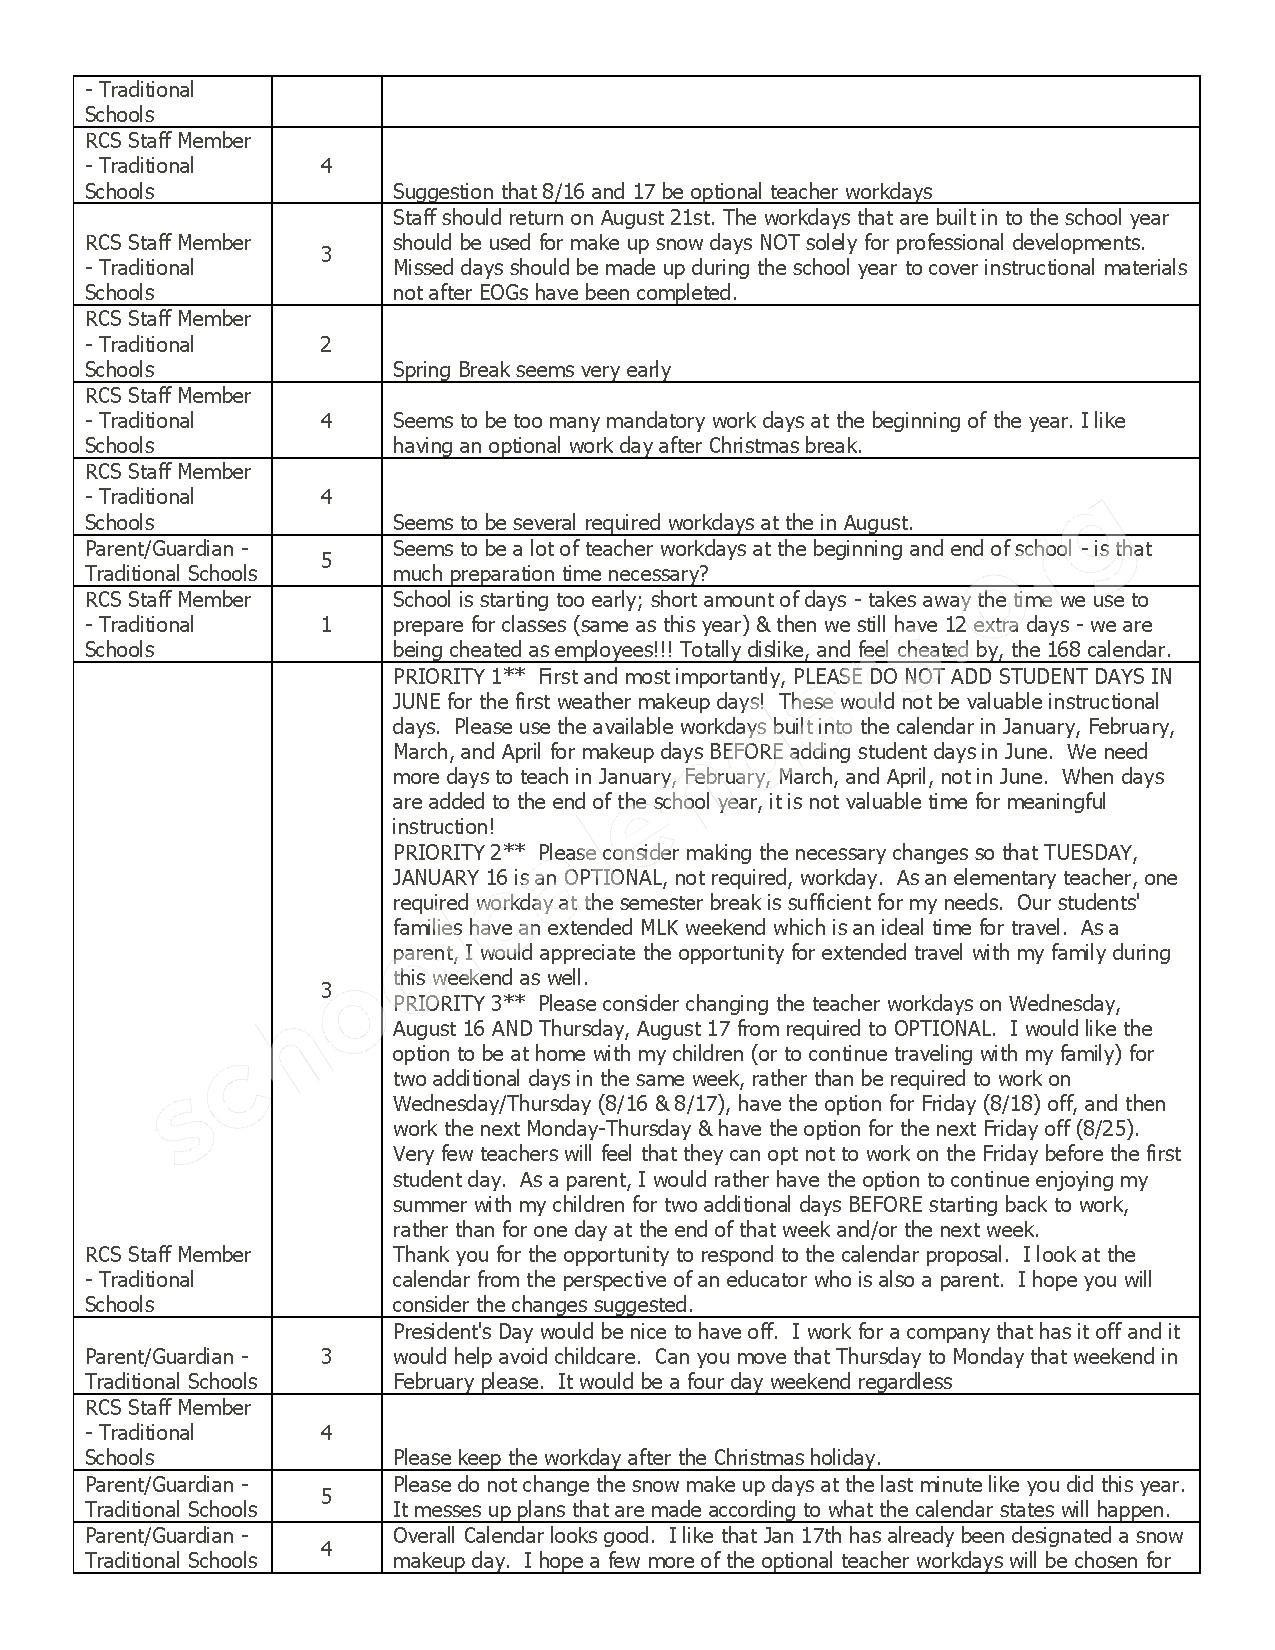 Extraordinary School Calendar Rockingham County Nc • Printable Blank_School Calendar Rockingham County Nc